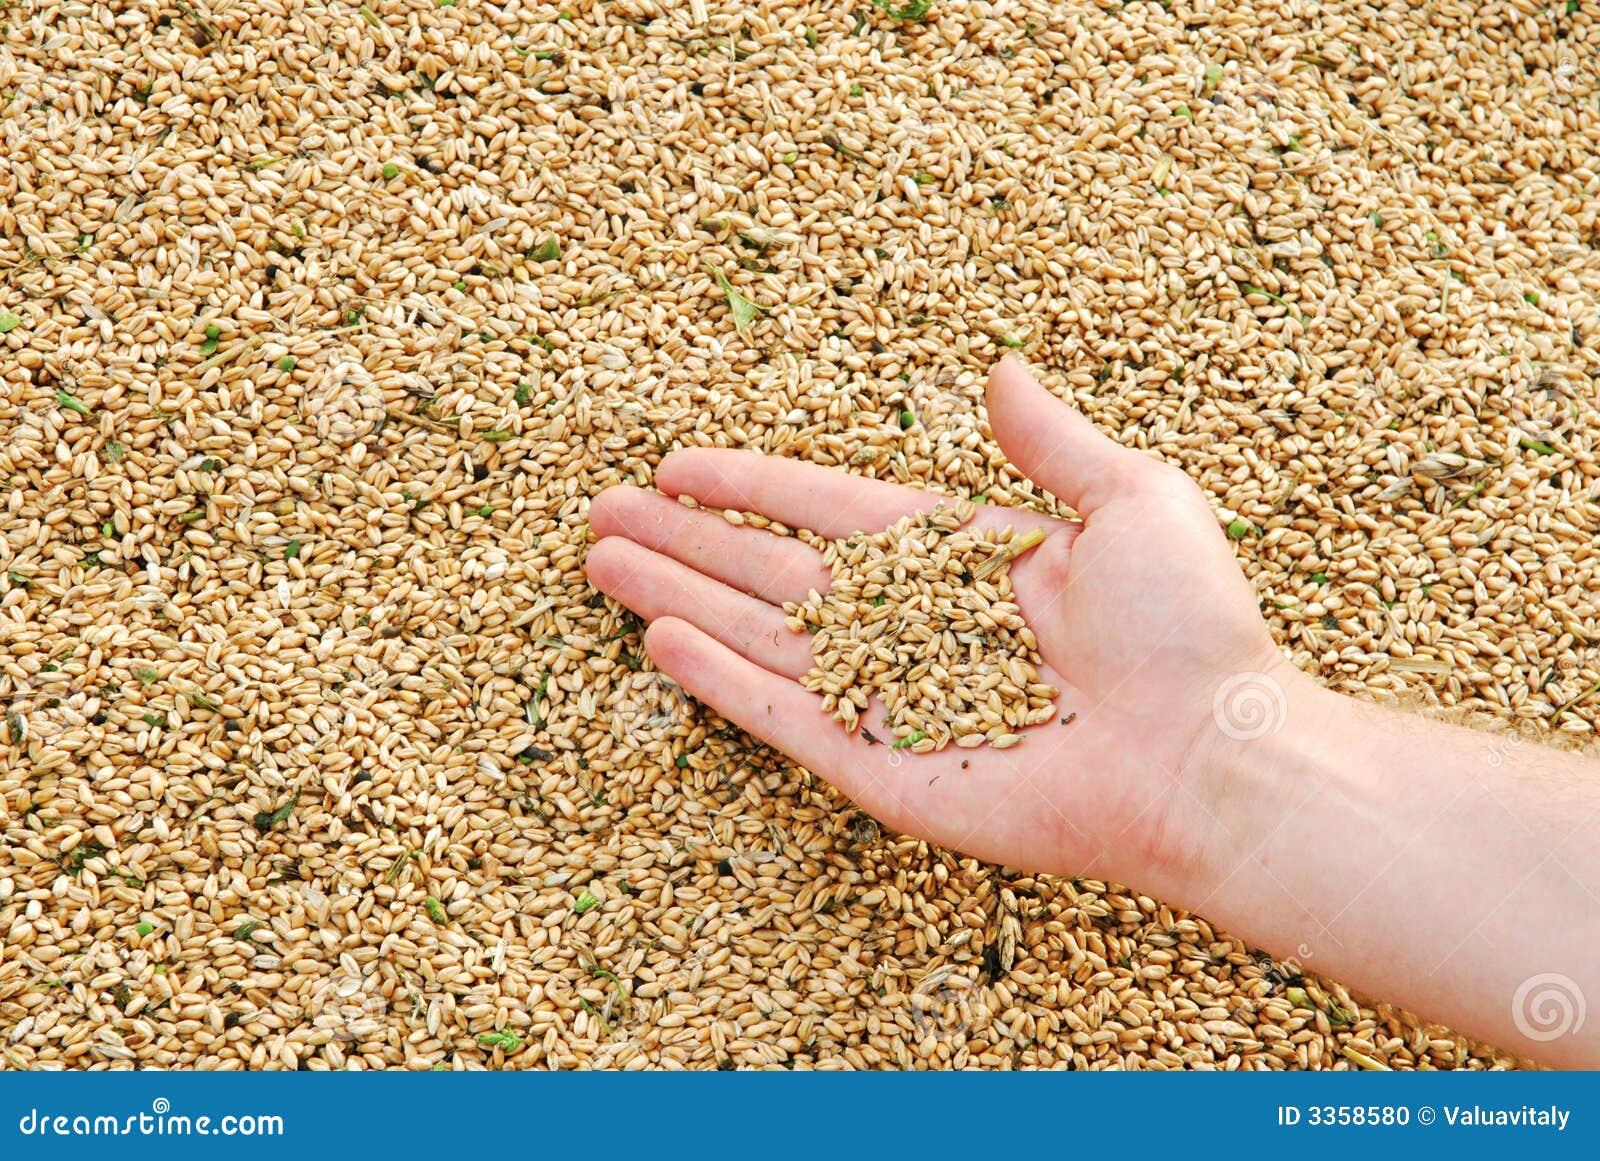 Grain times